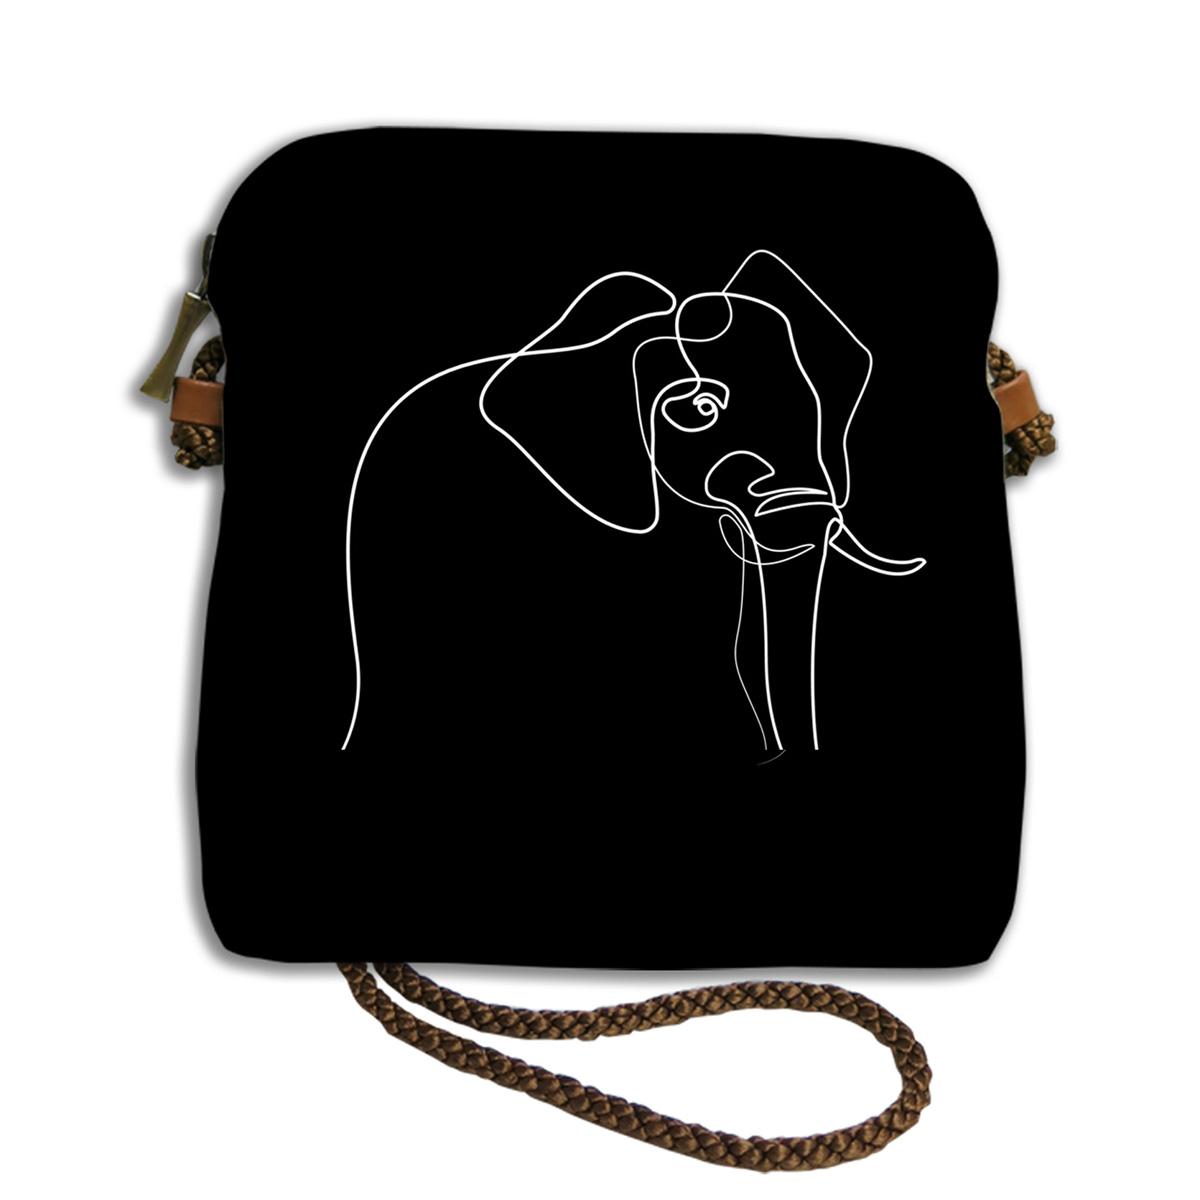 Sac bandoulière artisanal \'Quibe\' noir marron (Elephant)  - 18x17 cm - [A0337]